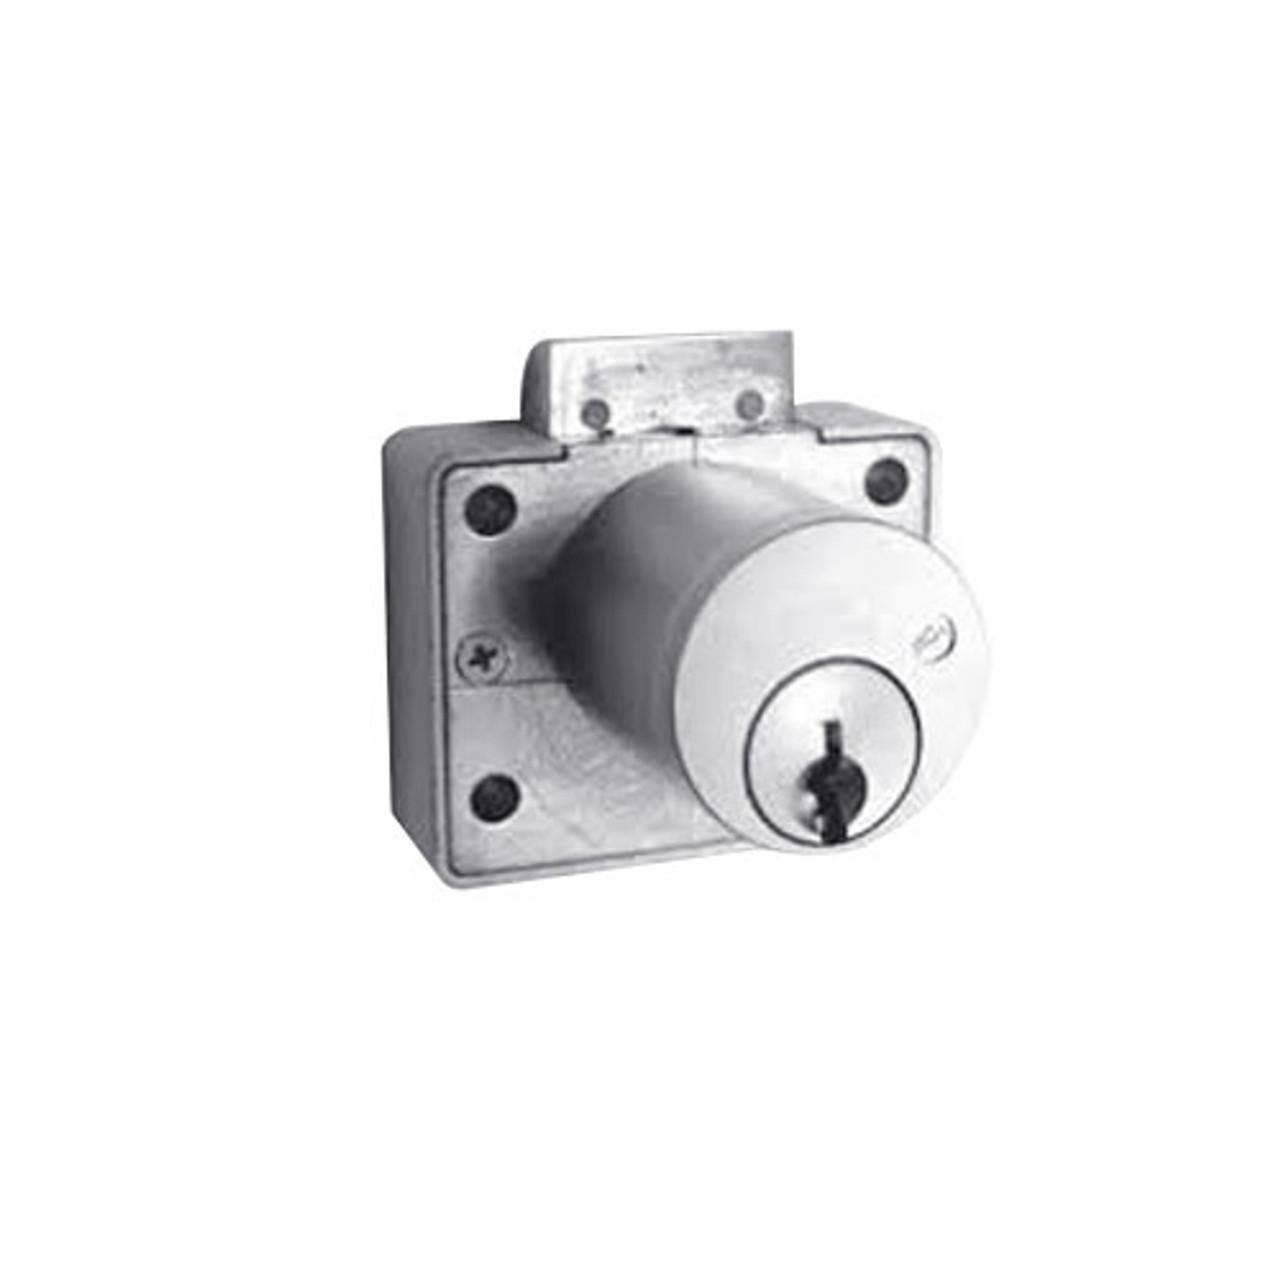 Olympus L78V-VH-KA101-26D-1-3/8 Drawer Latch Cabinet Lock in Satin Chrome Finish